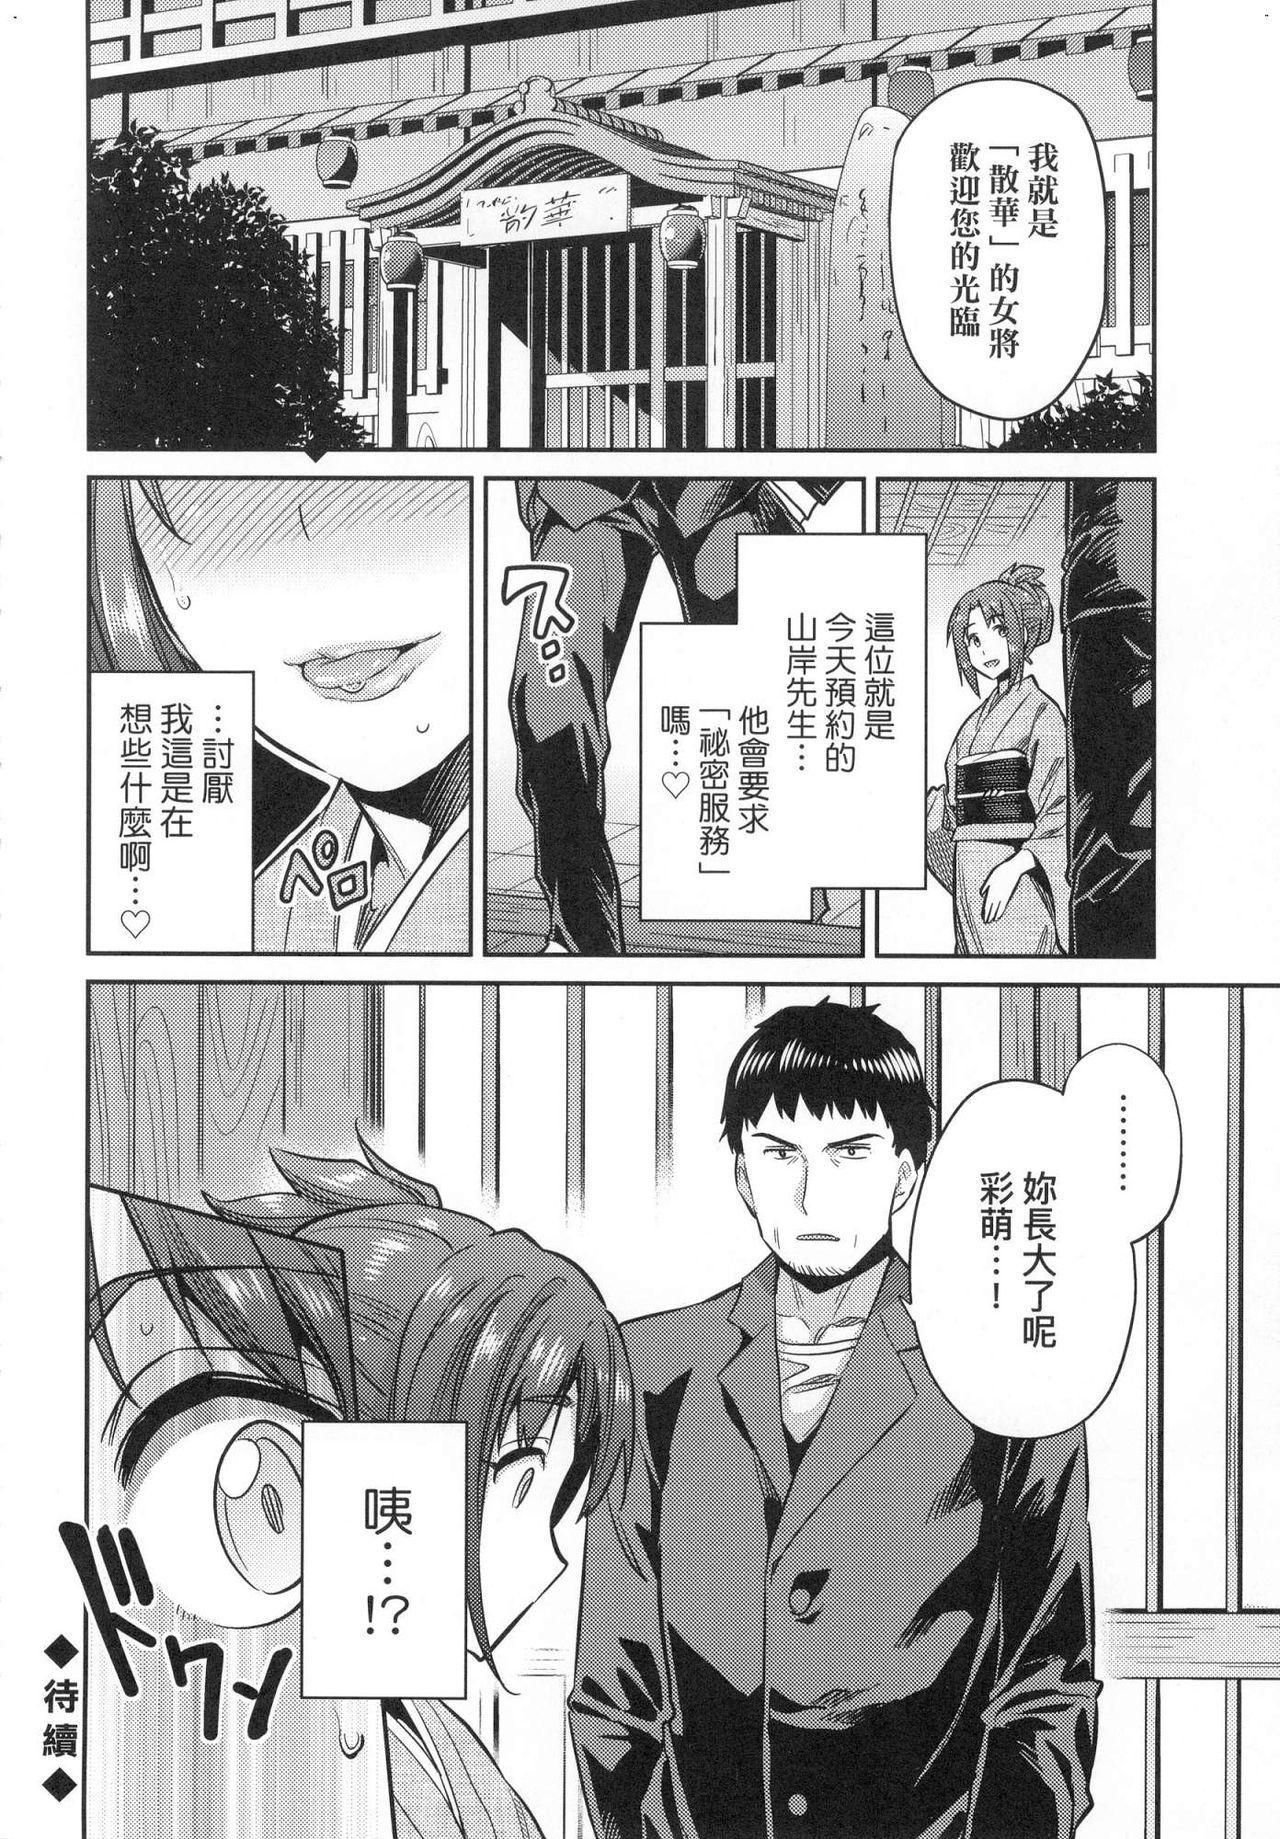 Kyousei Tanetsuke Express - Forced Seeding Express 193